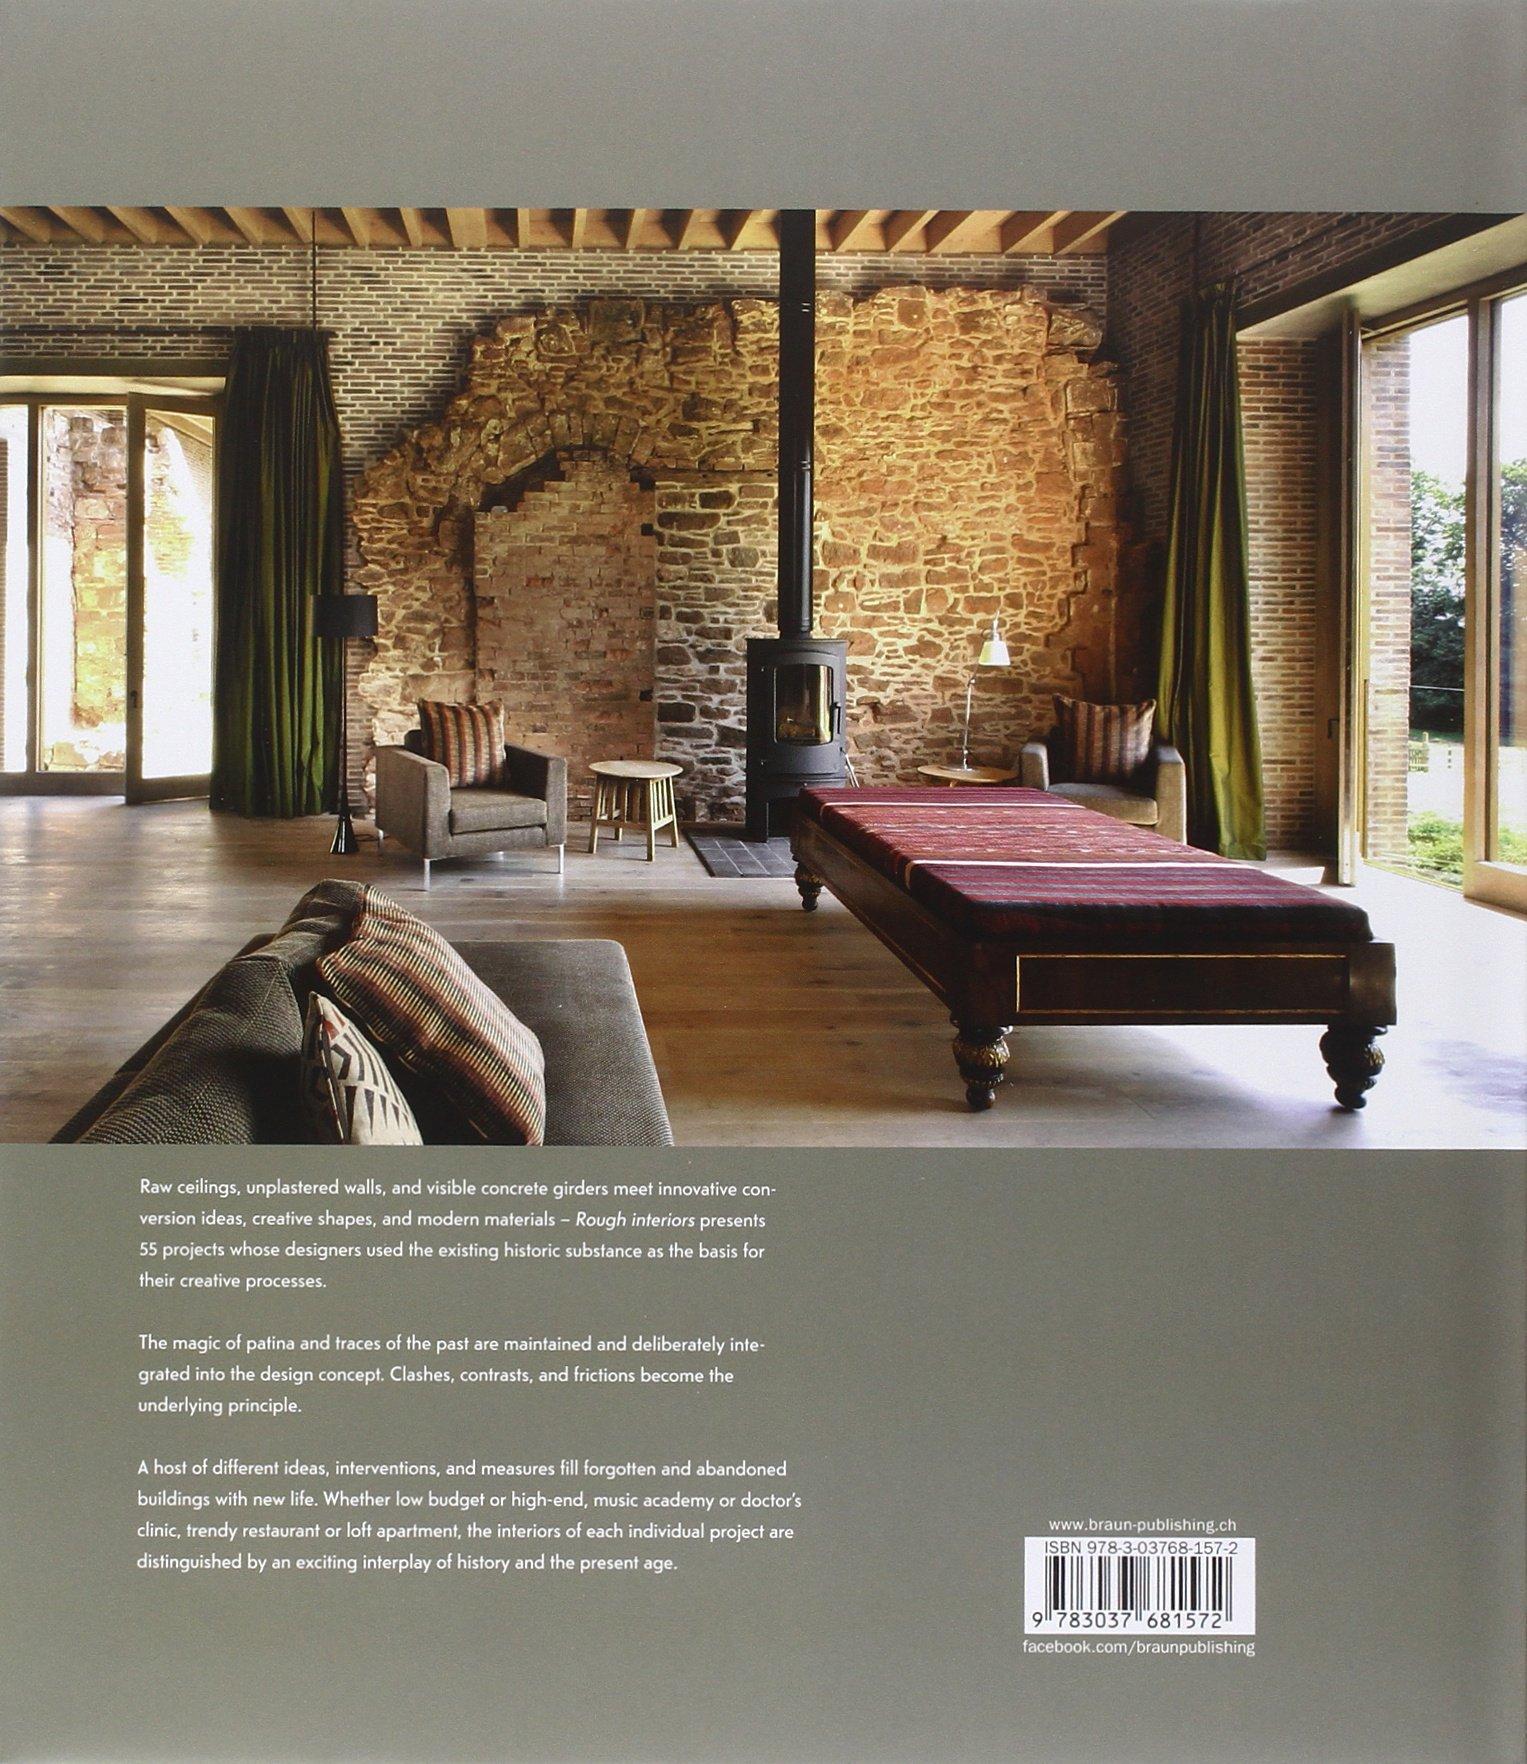 Rough Interiors: Sibylle Kramer: 9783037681572: Amazon.com: Books